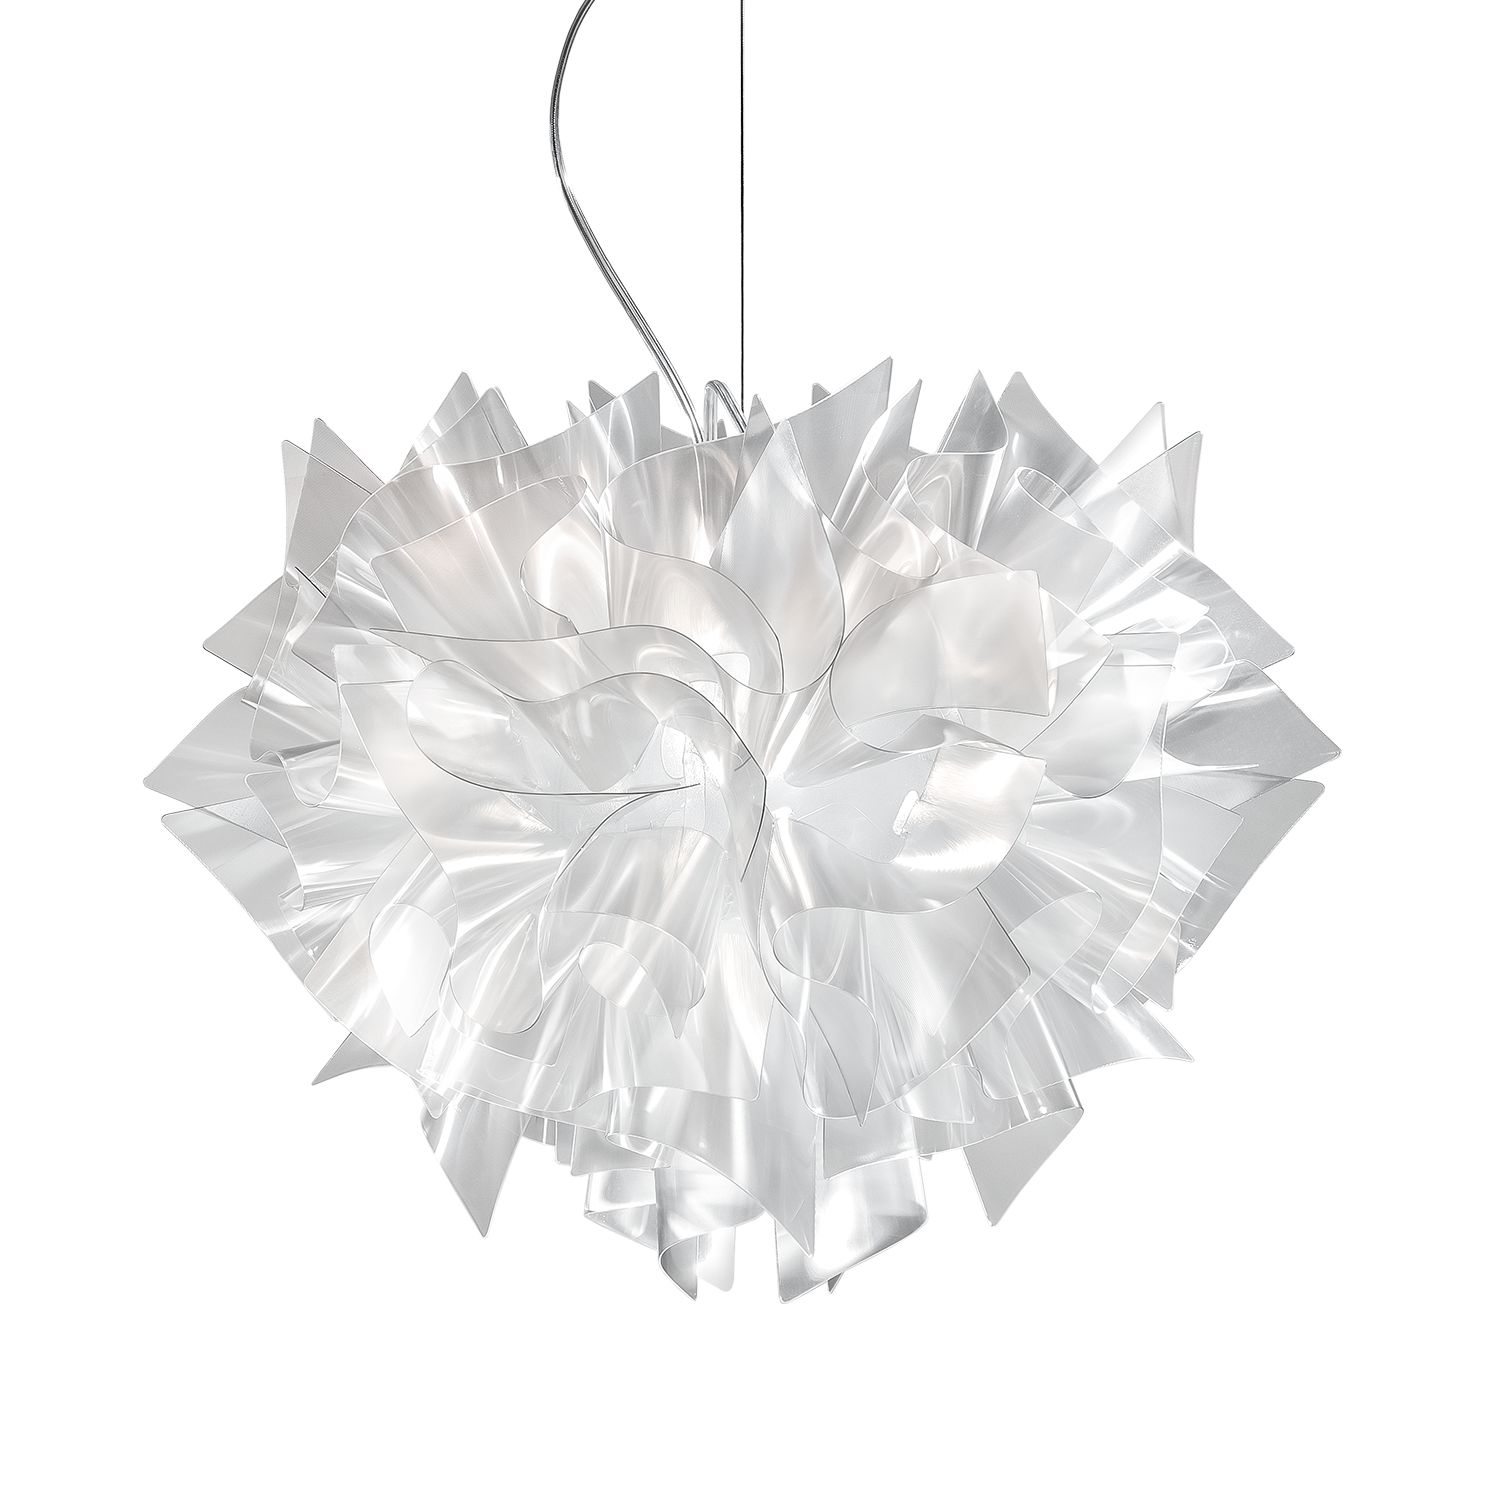 pendelleuchte veli 2 flammig transparent lentiflex slamp a jetzt kaufen. Black Bedroom Furniture Sets. Home Design Ideas